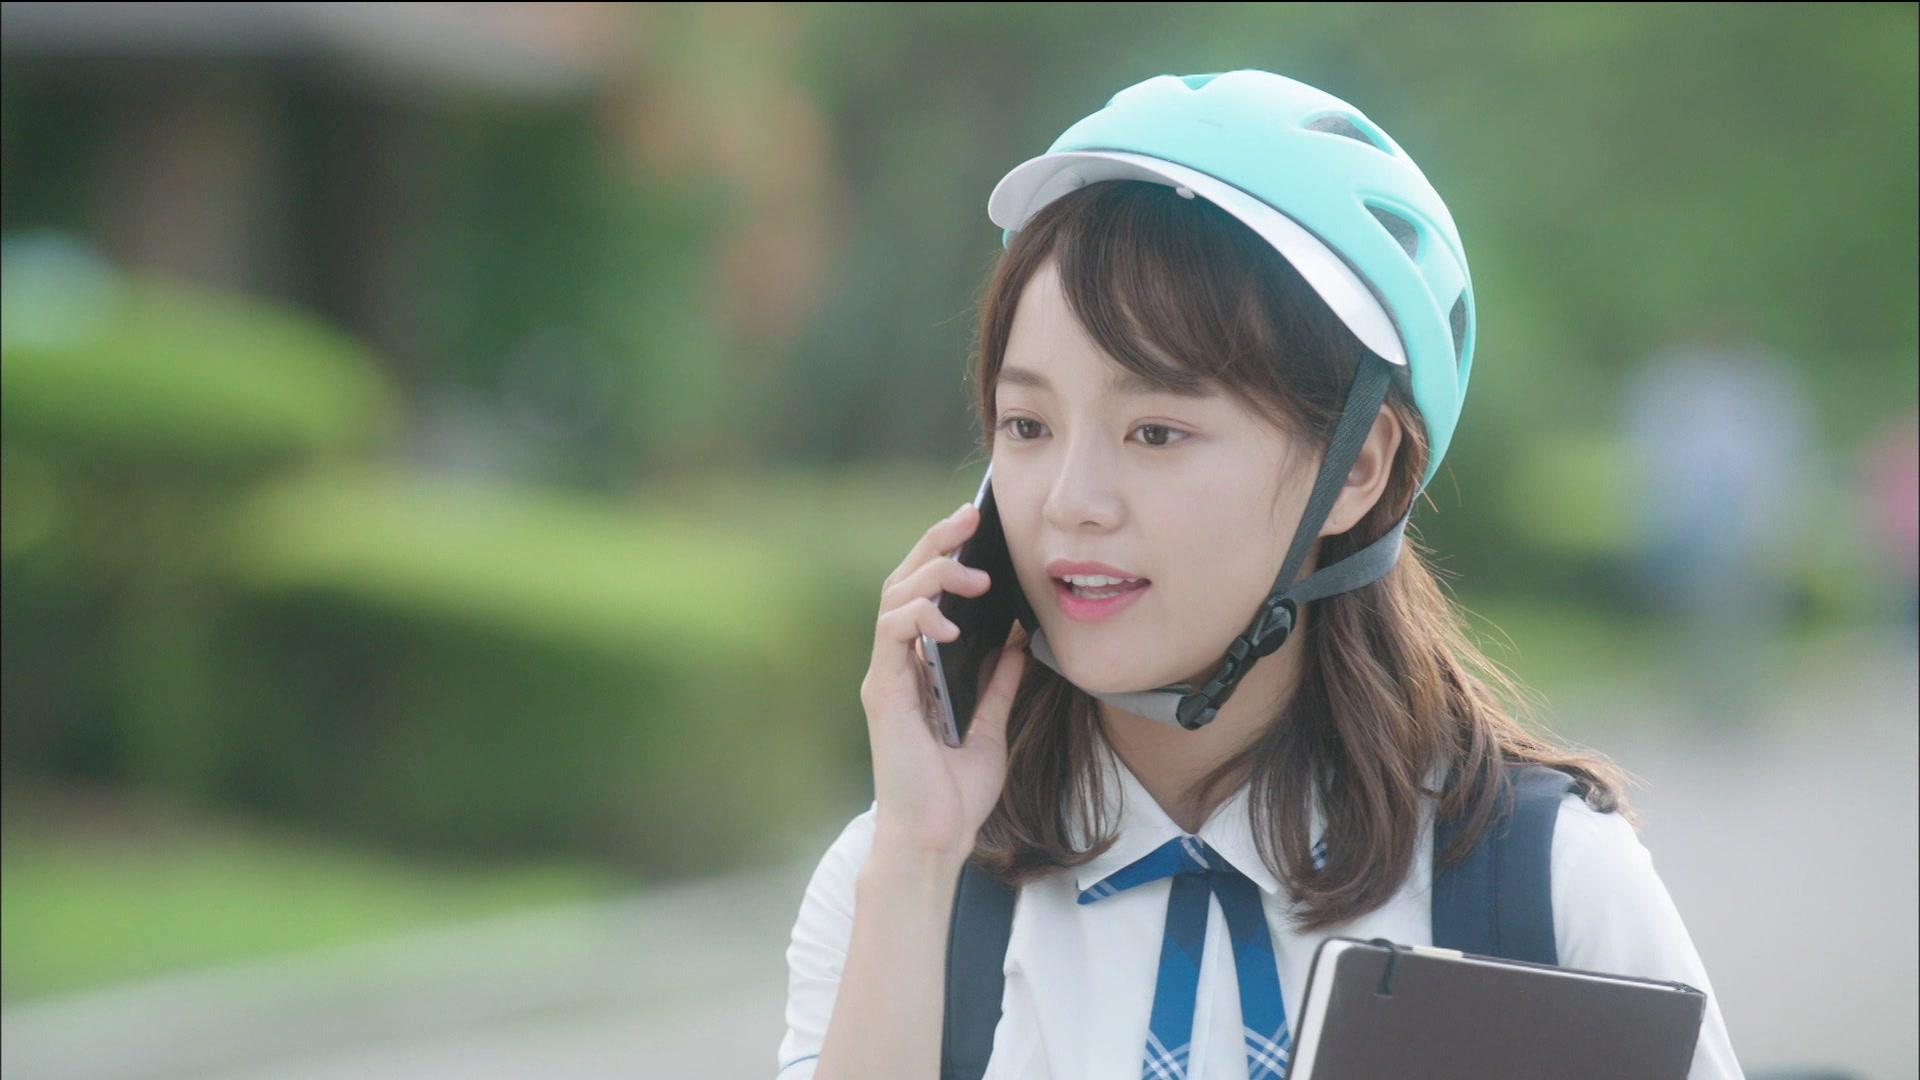 School 2017 - 학교 2017 - Watch Full Episodes Free - Korea - TV